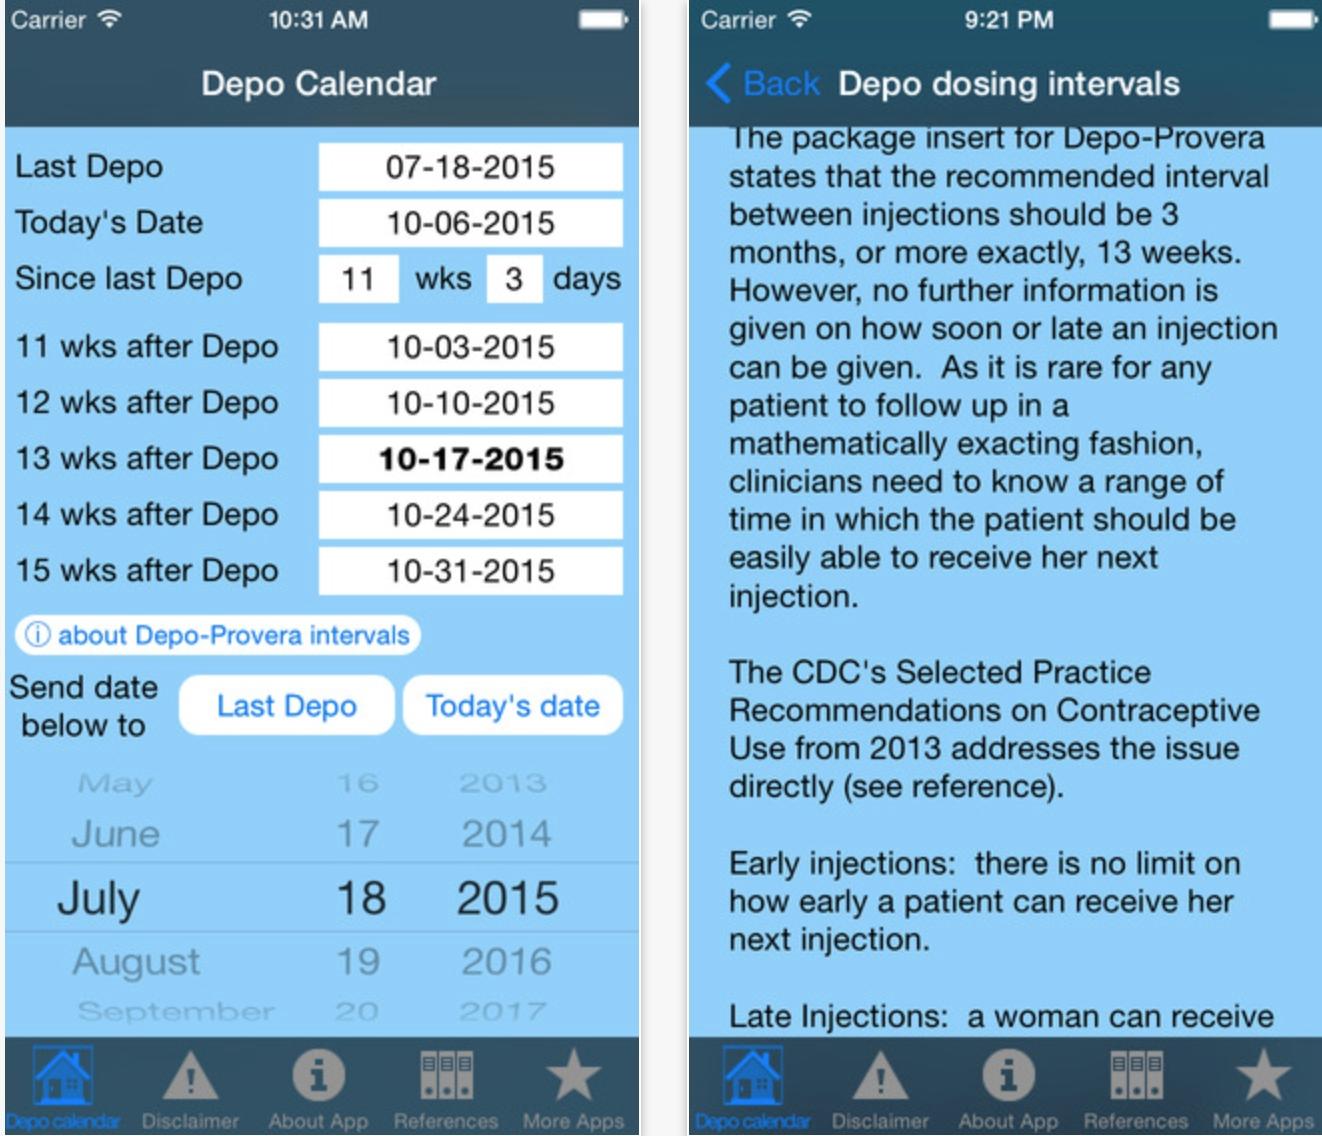 Depo Calendar App Could Significantly Improve Contraception  Depo Provera Scheudle